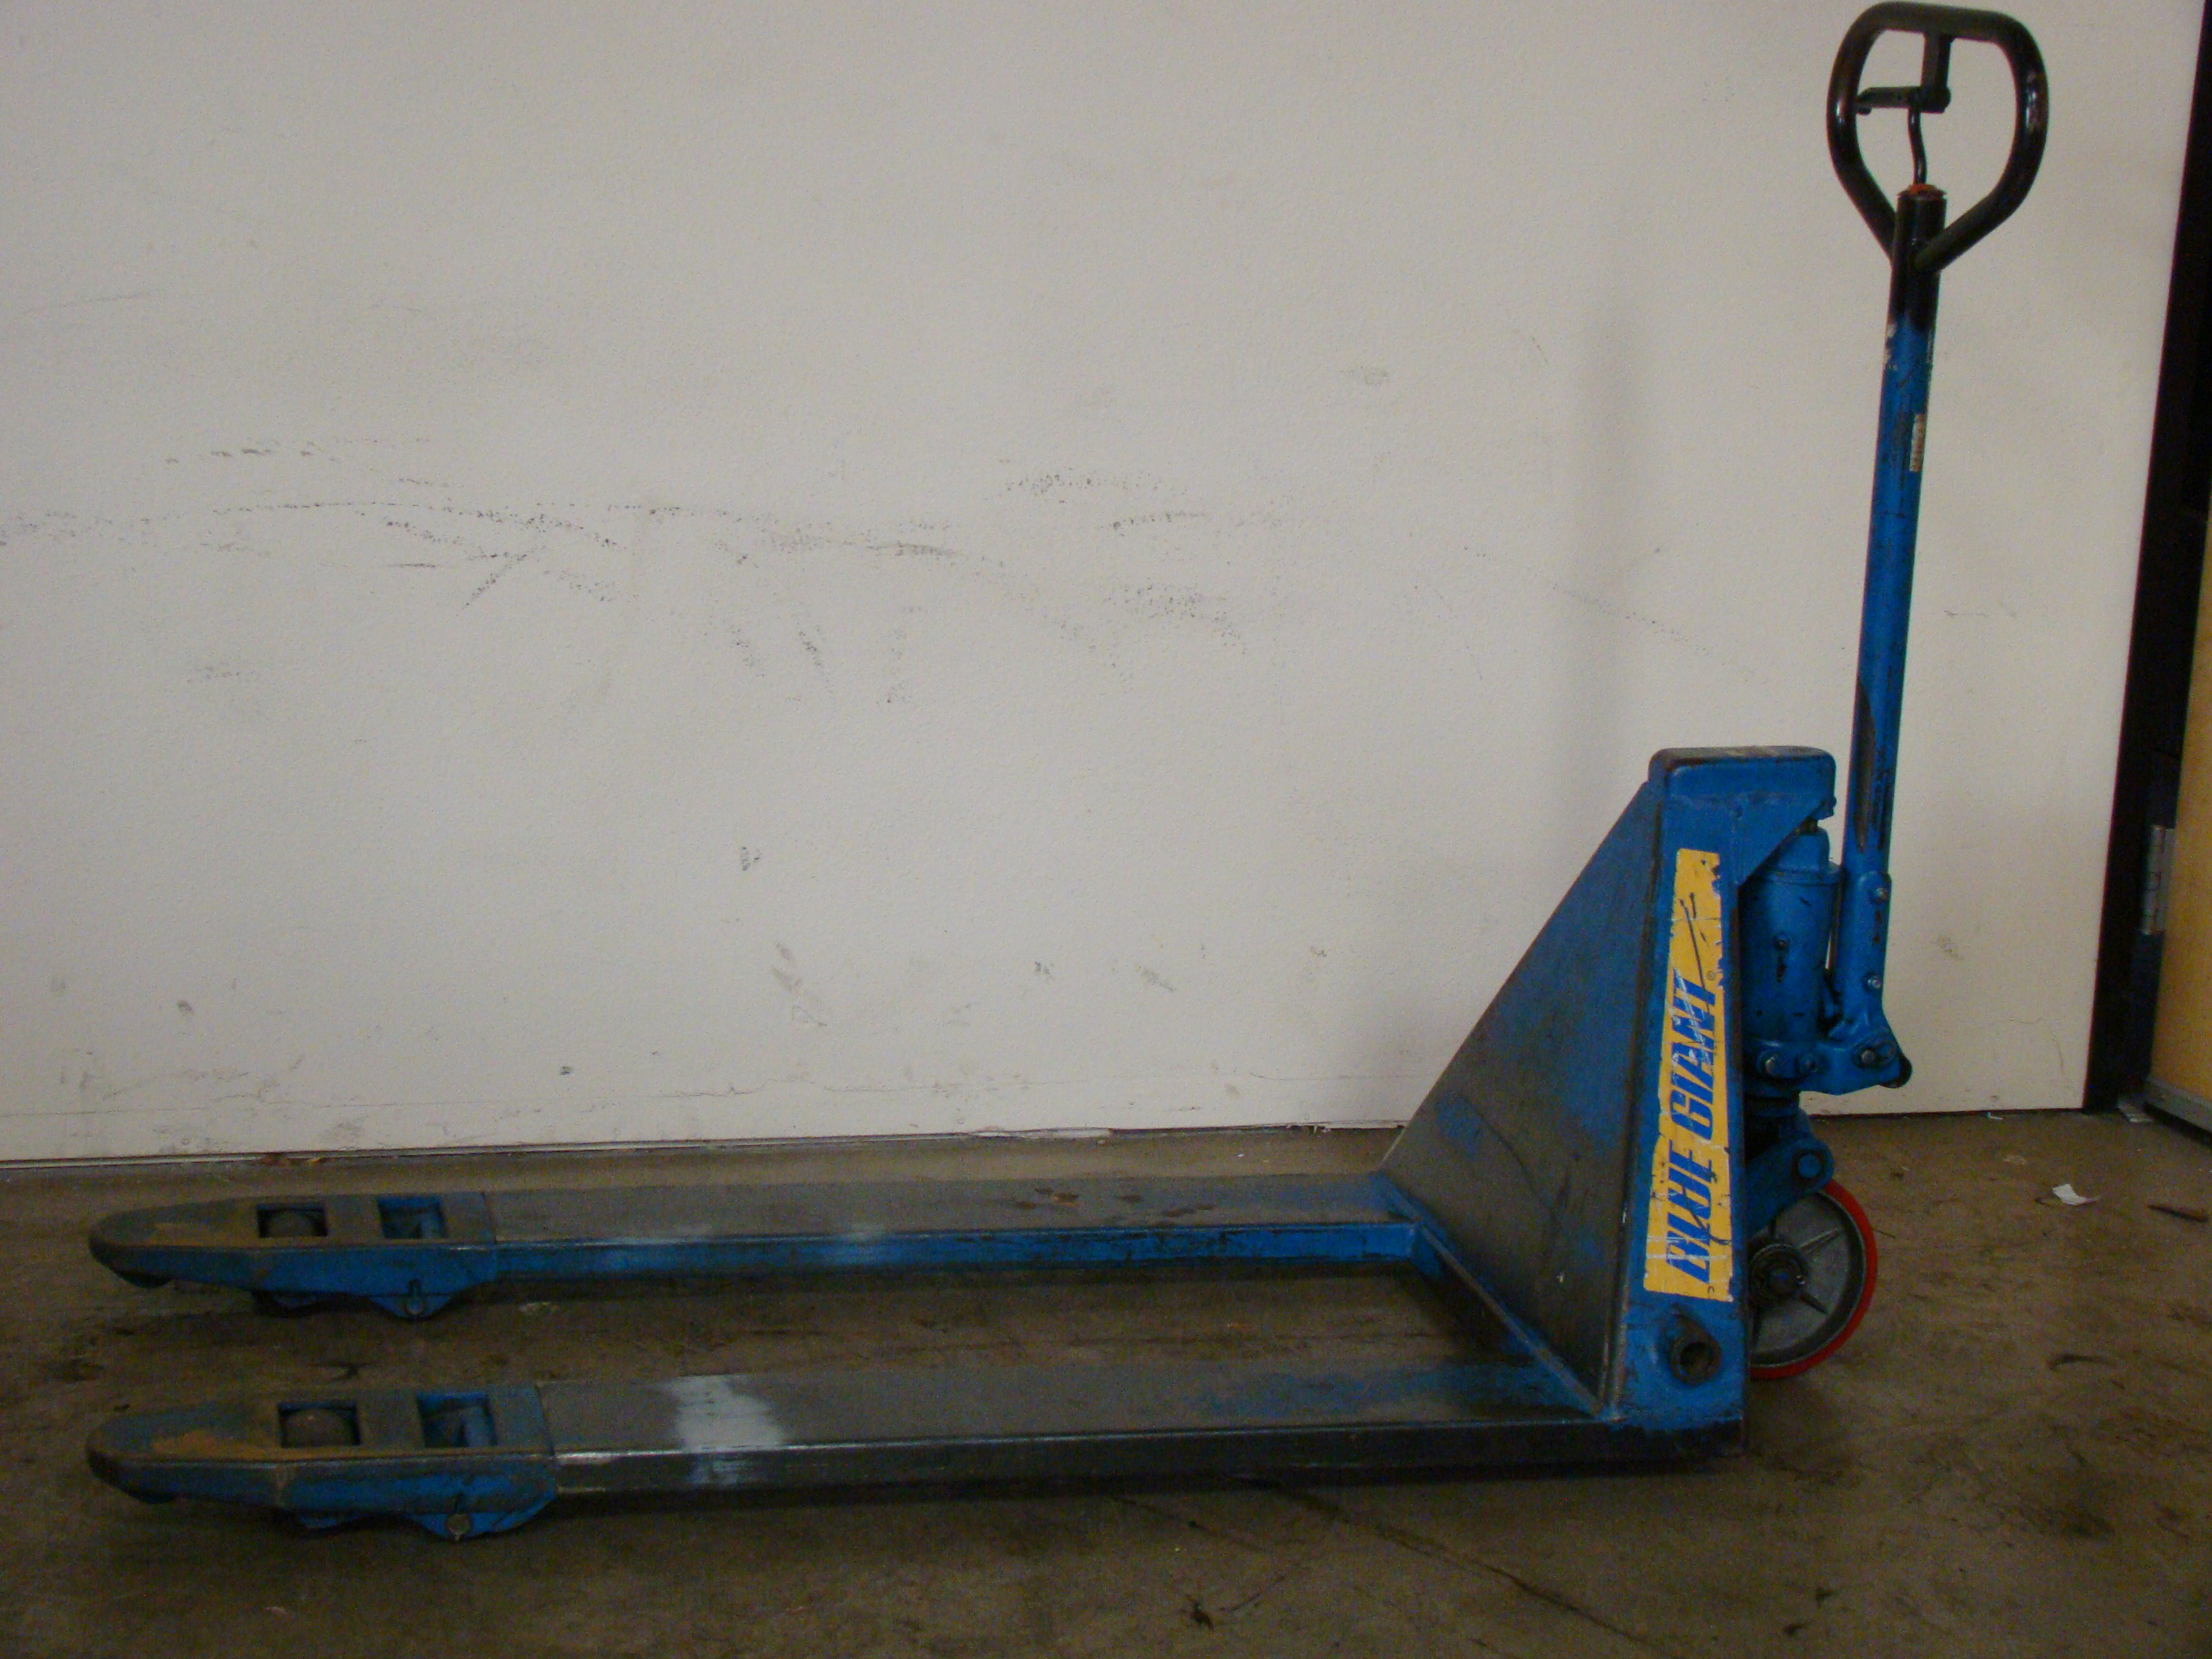 Blue Giant Pallet Jack, Model T50